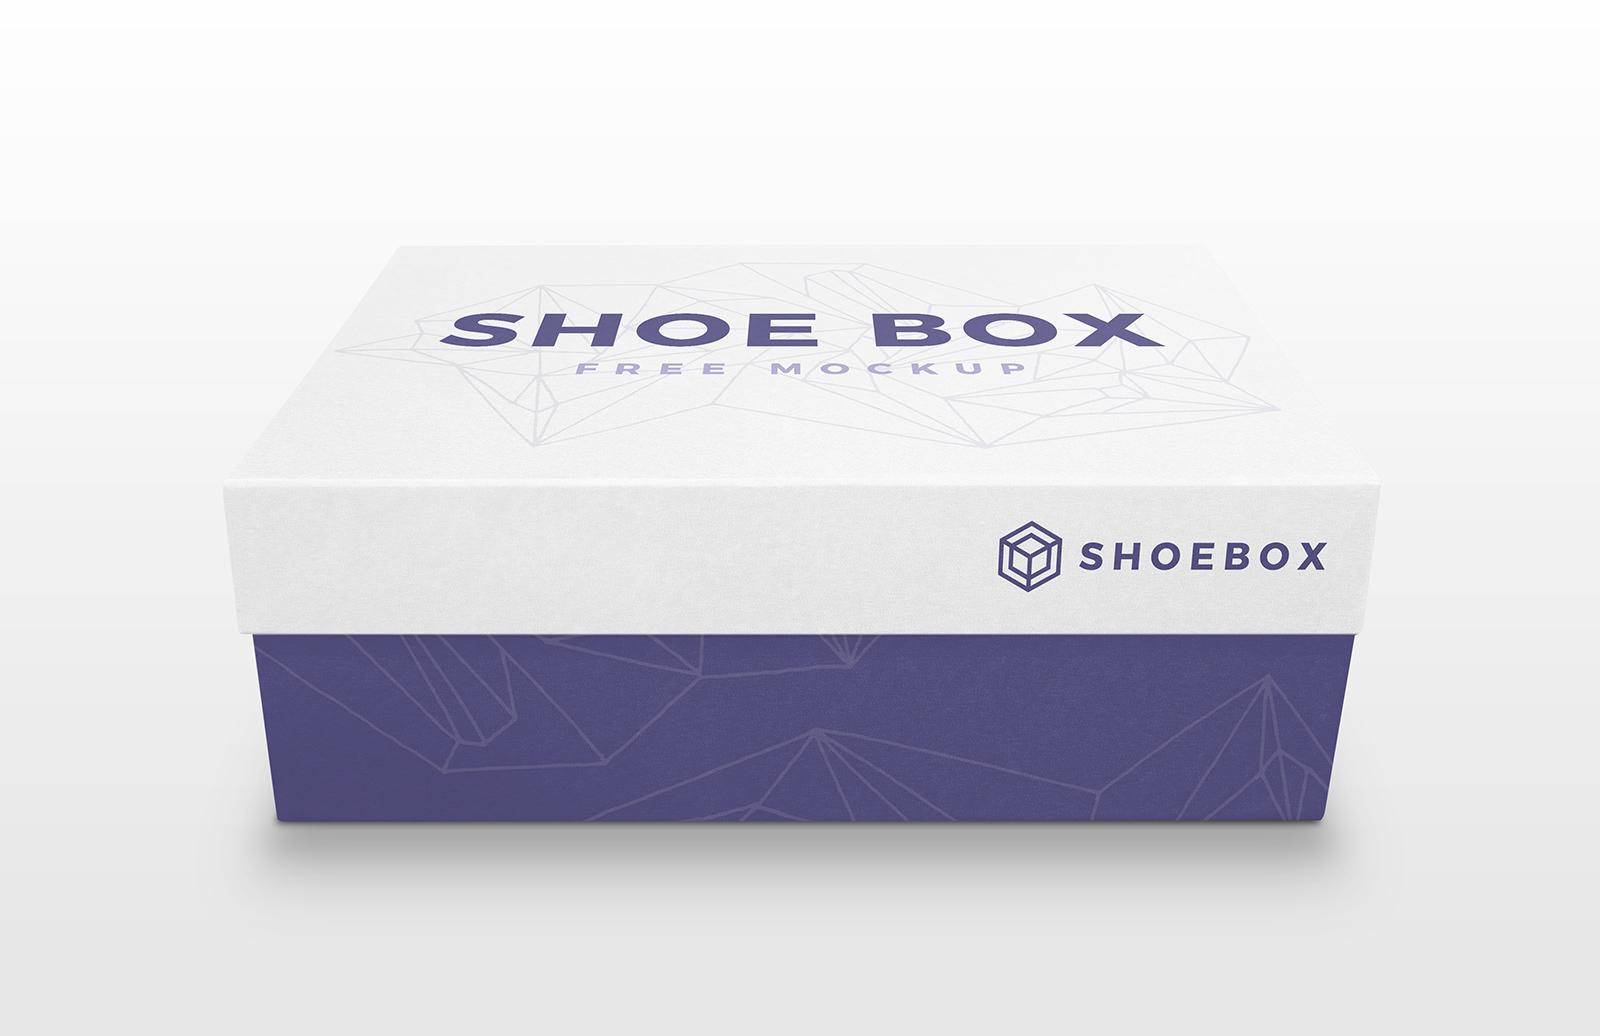 Free Shoe Box Mockup PSD